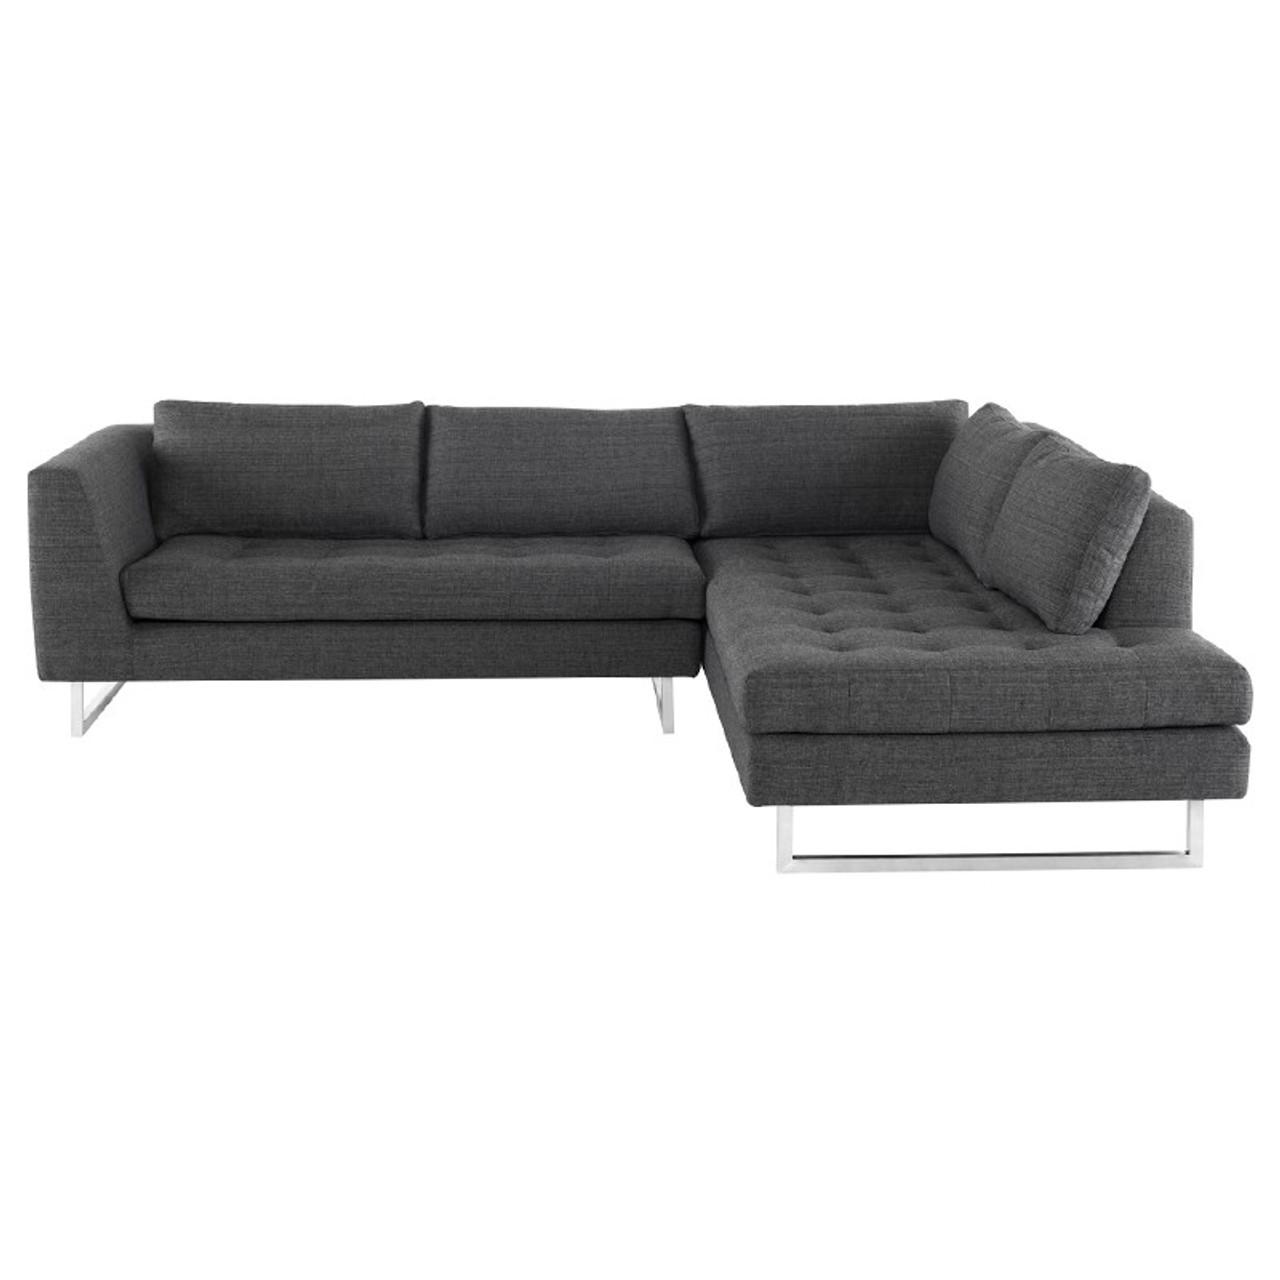 Janis Dark Grey Fabric Tufted Sectional Sofa 105\